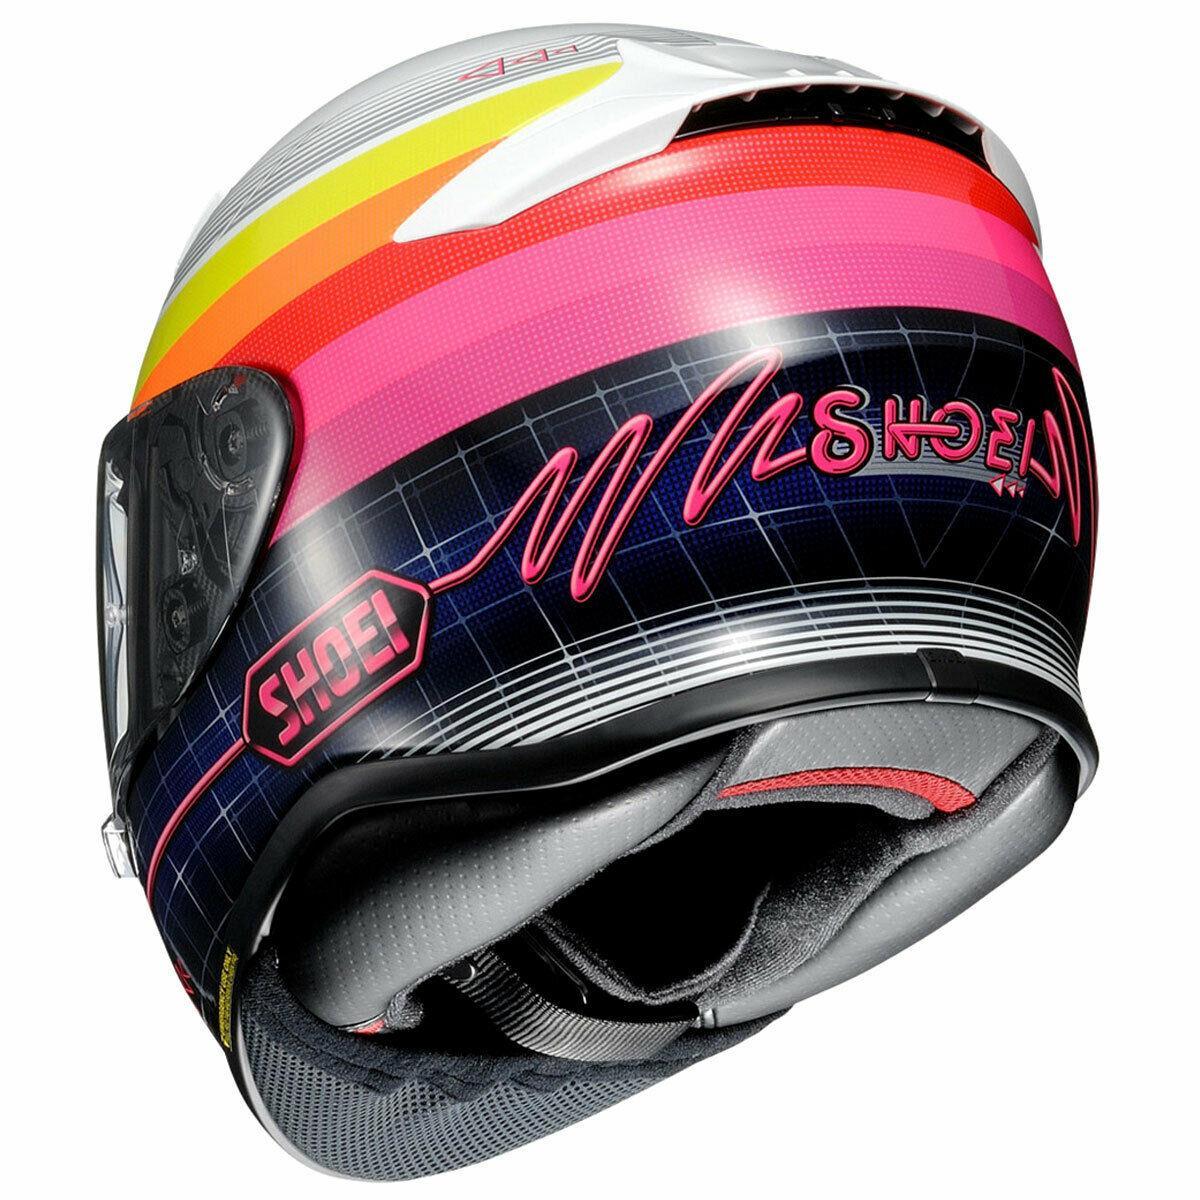 Shoei-NXR-Full-Face-Motorcycle-Motorbike-Premium-Helmet-RF-1200 thumbnail 46